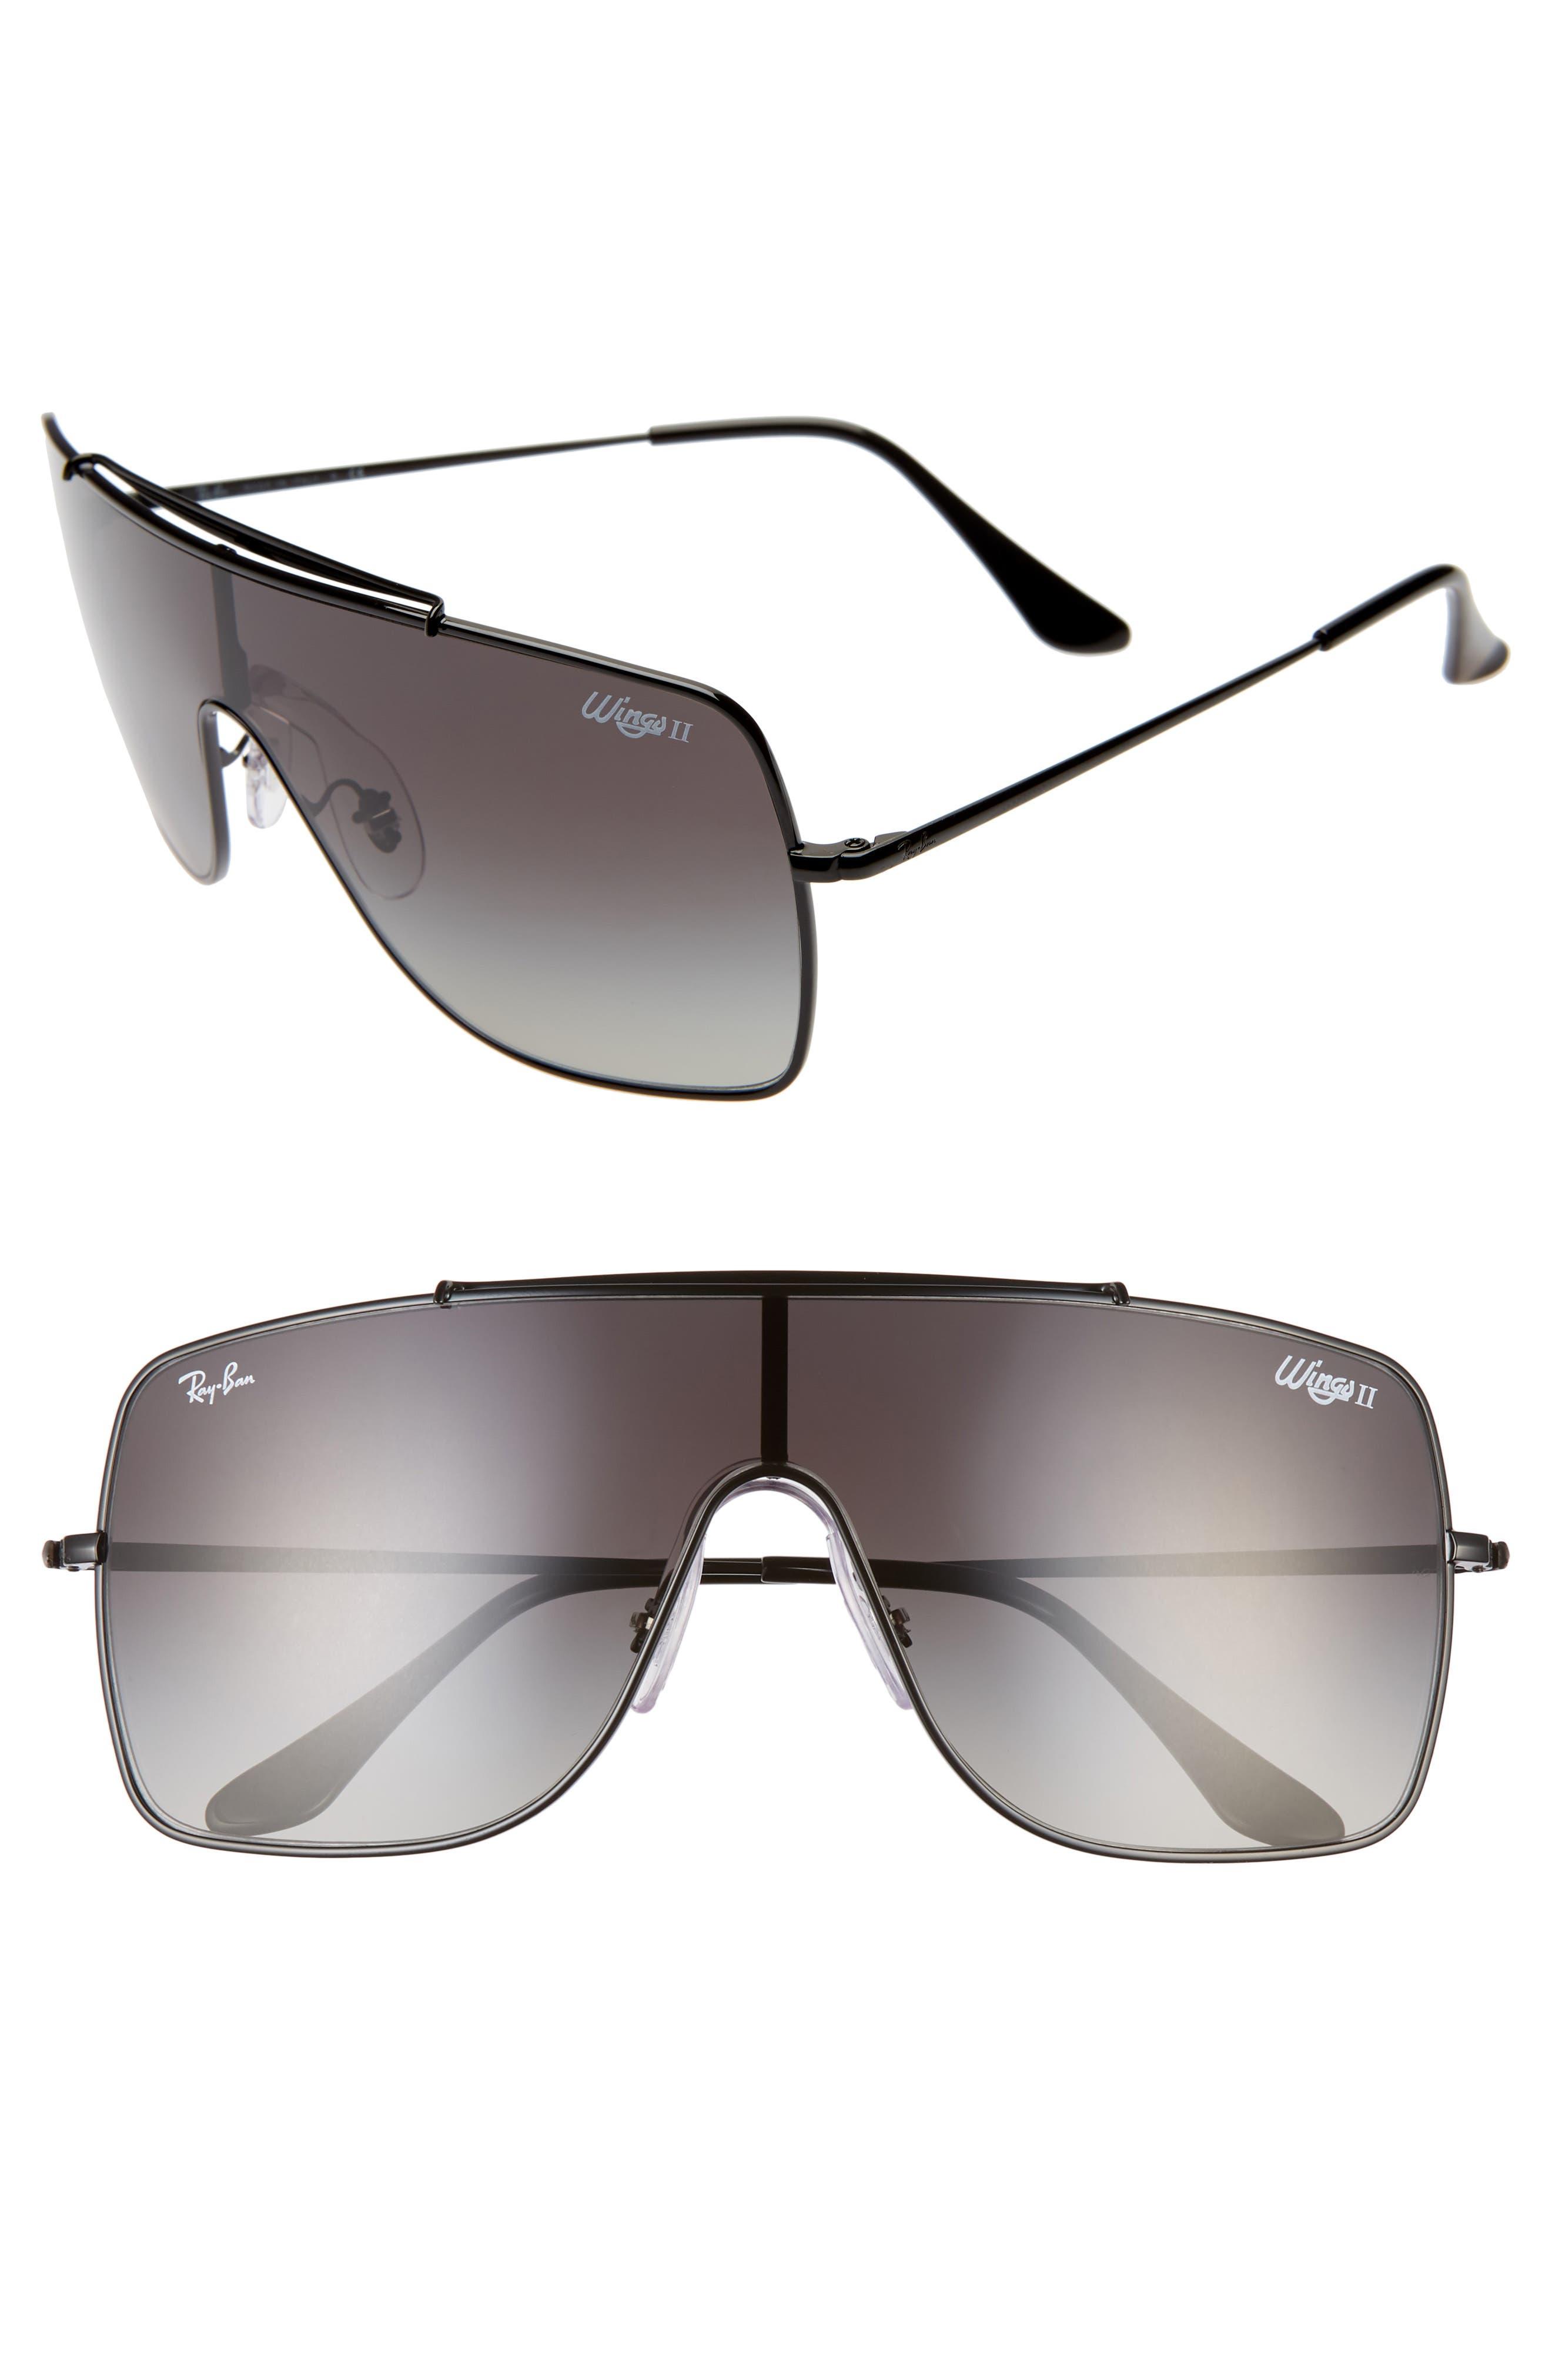 Ray-Ban 135Mm Gradient Shield Sunglasses - Black